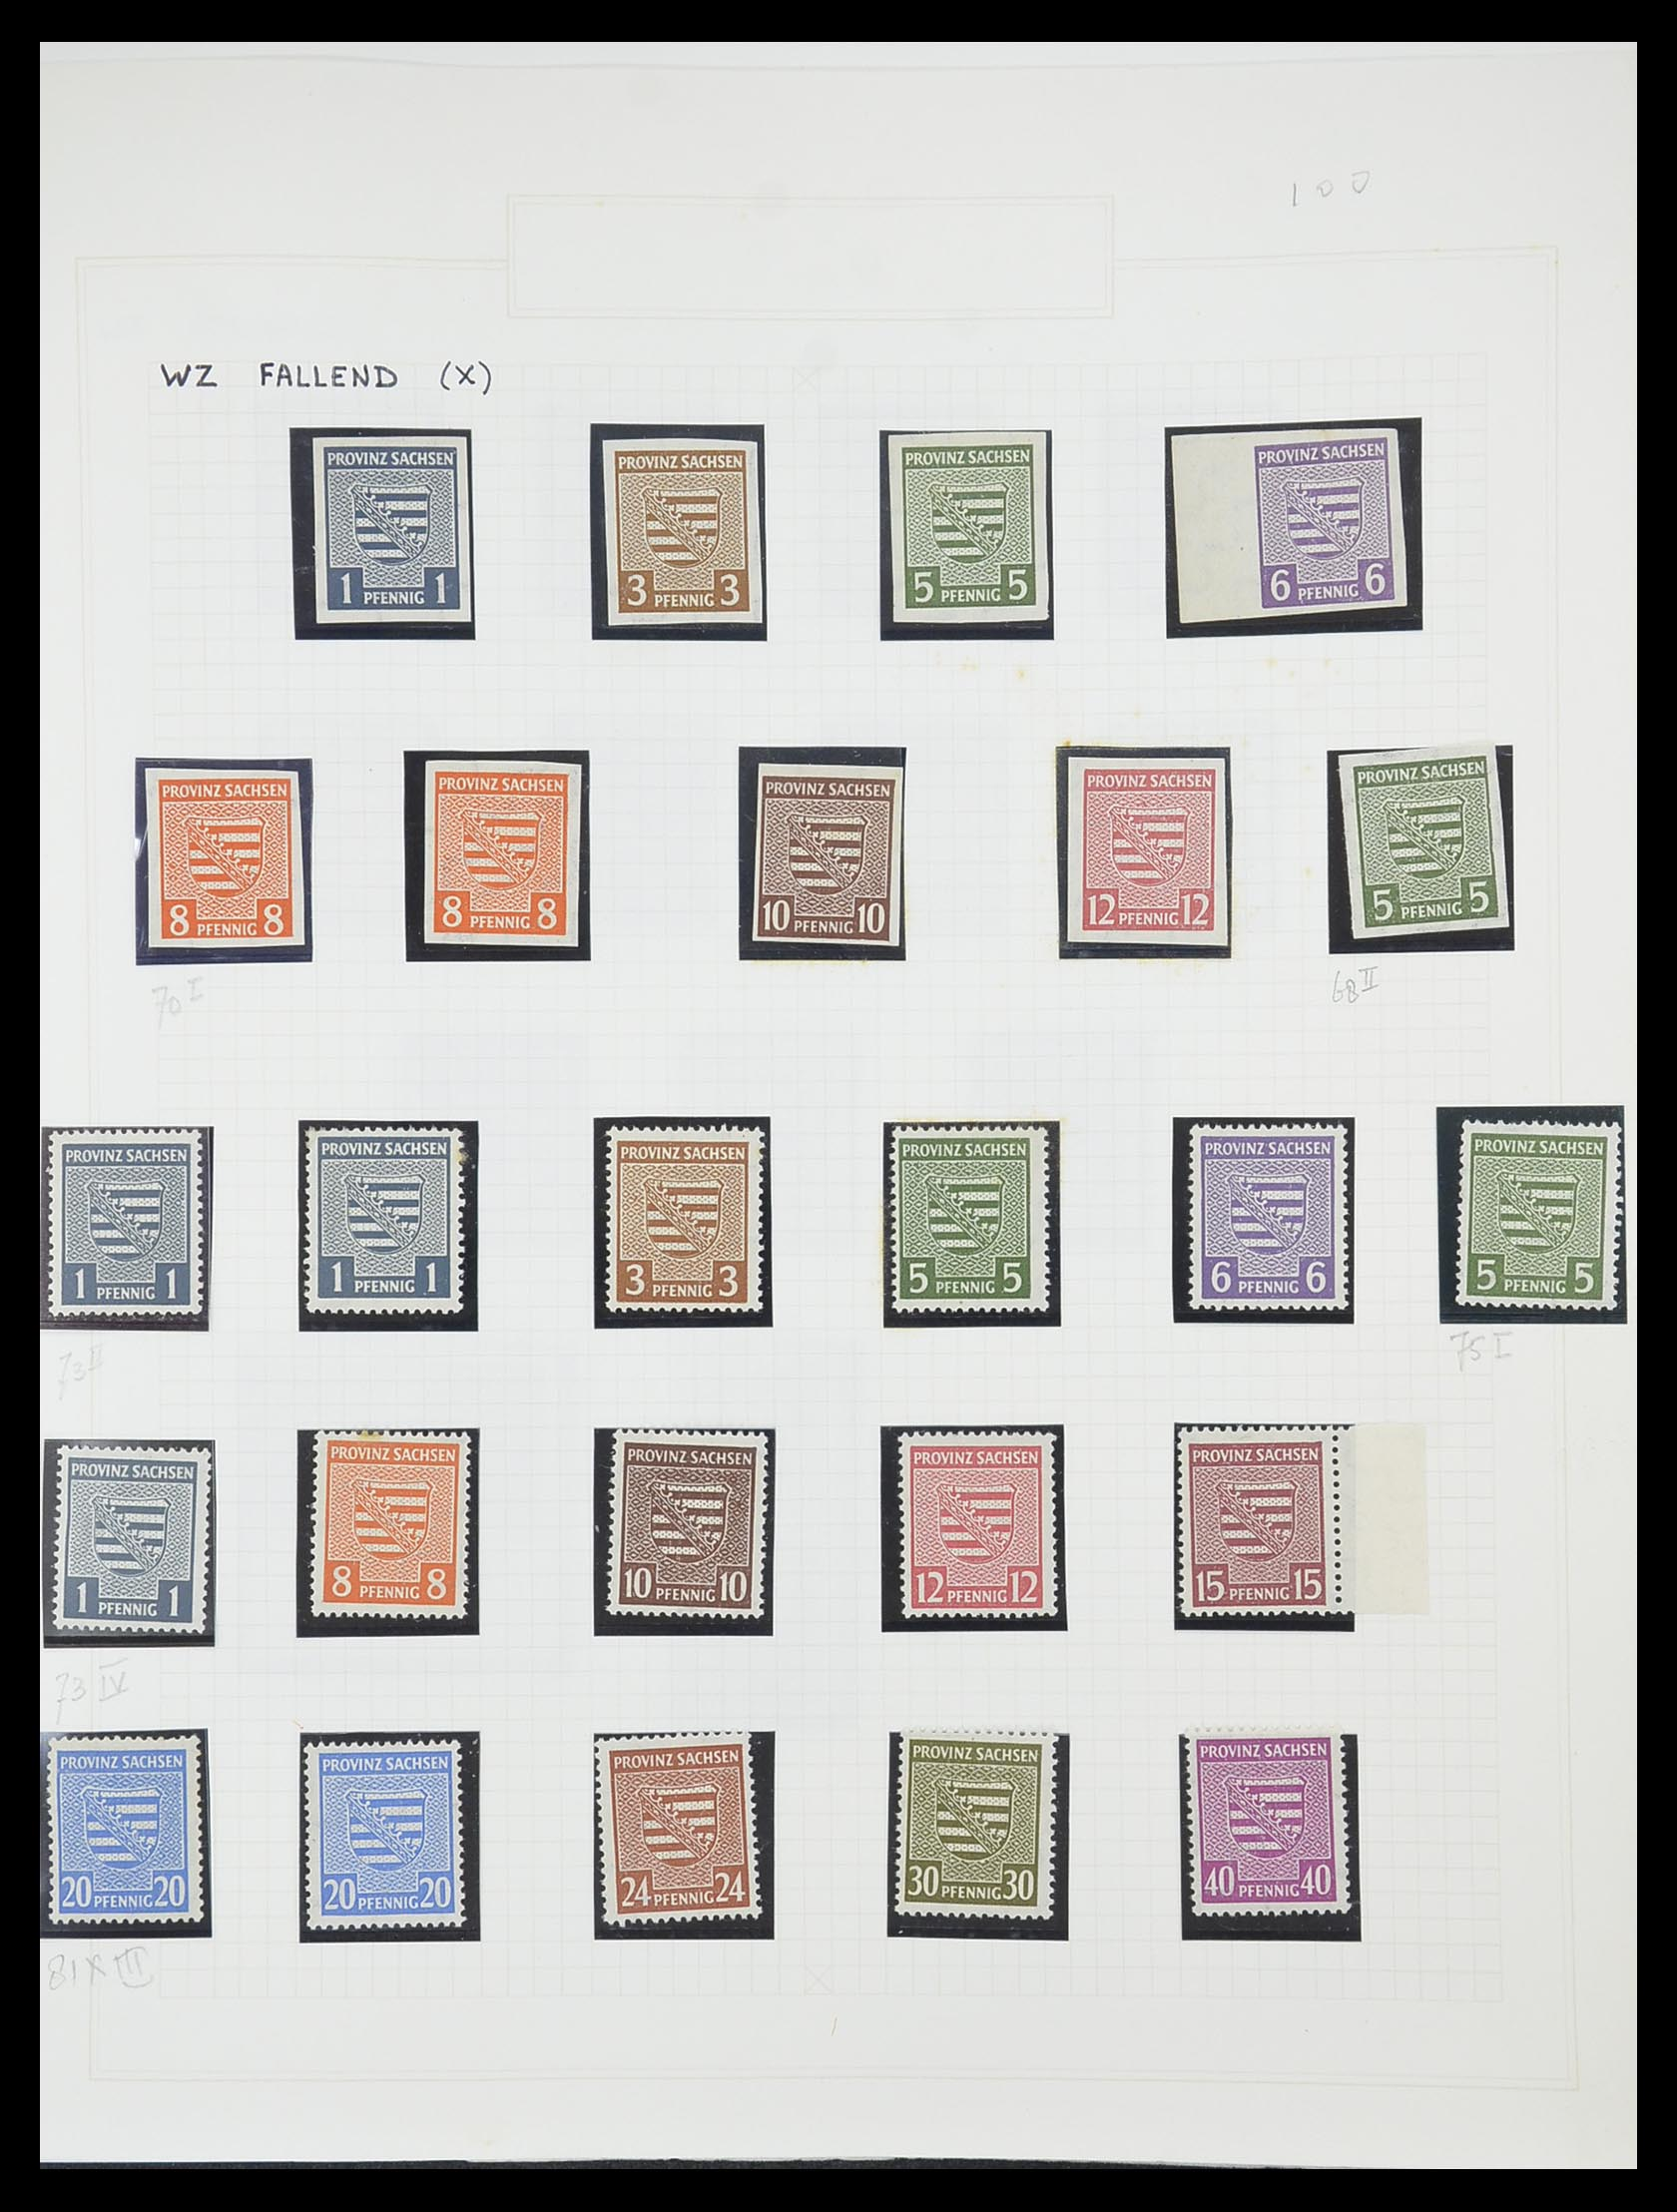 33698 020 - Postzegelverzameling 33698 Sovjet Zone 1945-1948.